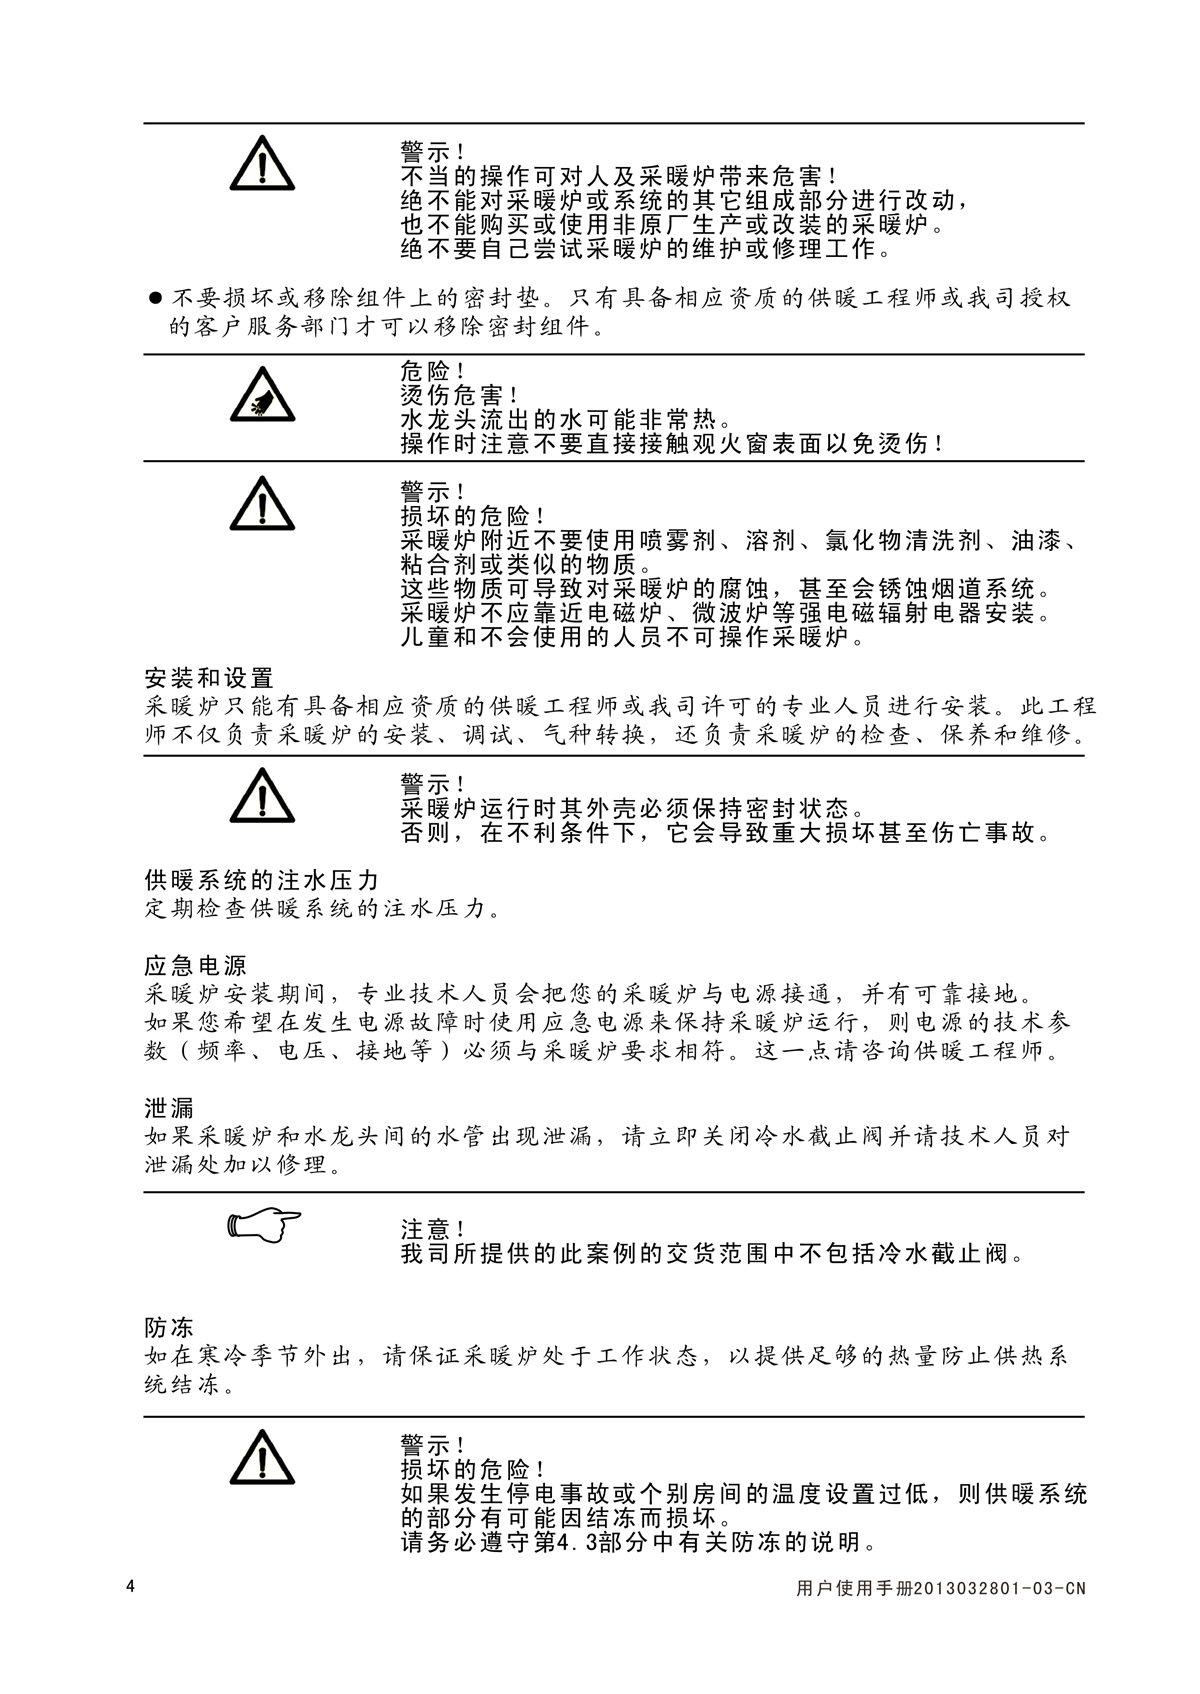 ES16A系列-用户使用手册-5_01.jpg